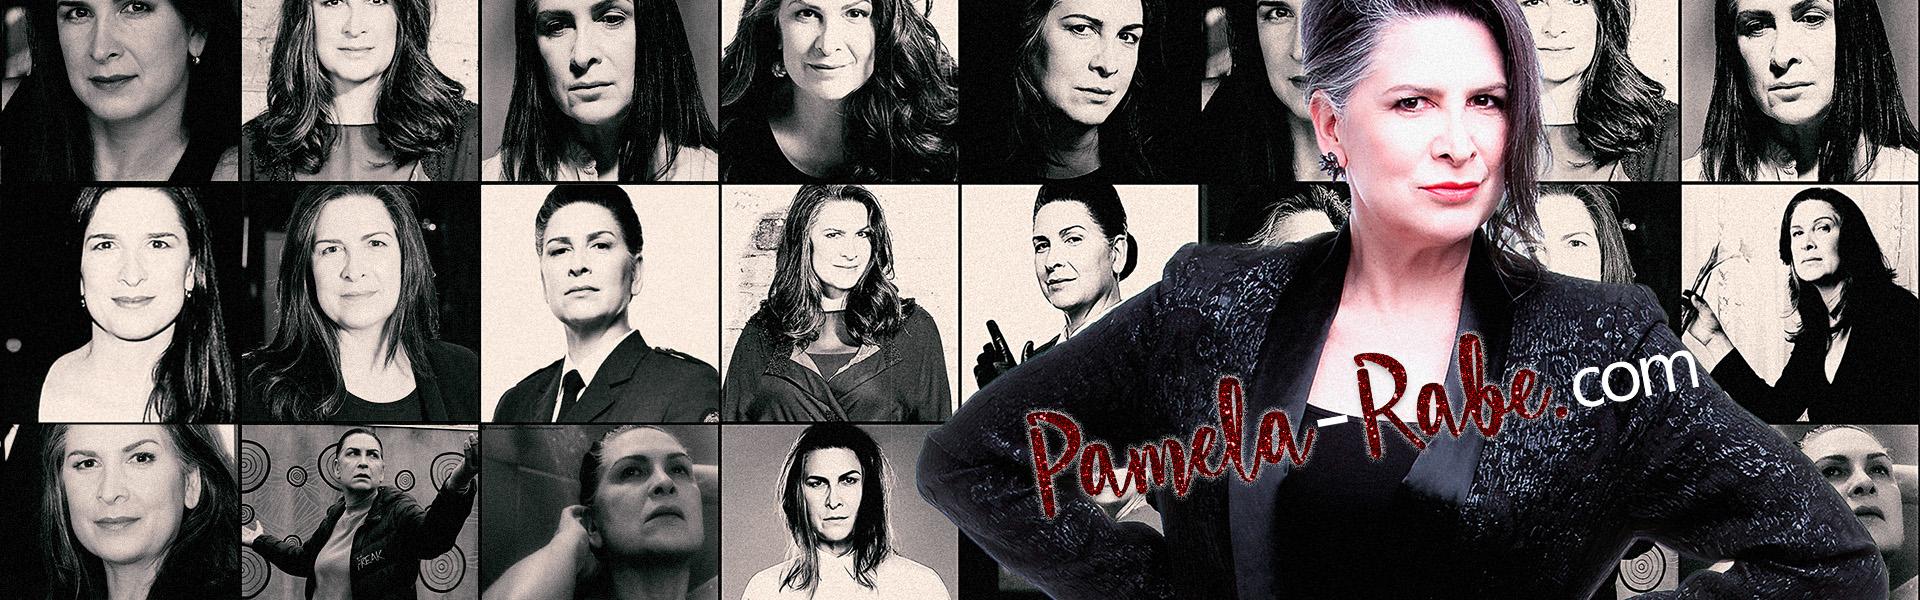 Pamela-Rabe.com | Pamela Rabe Fansite